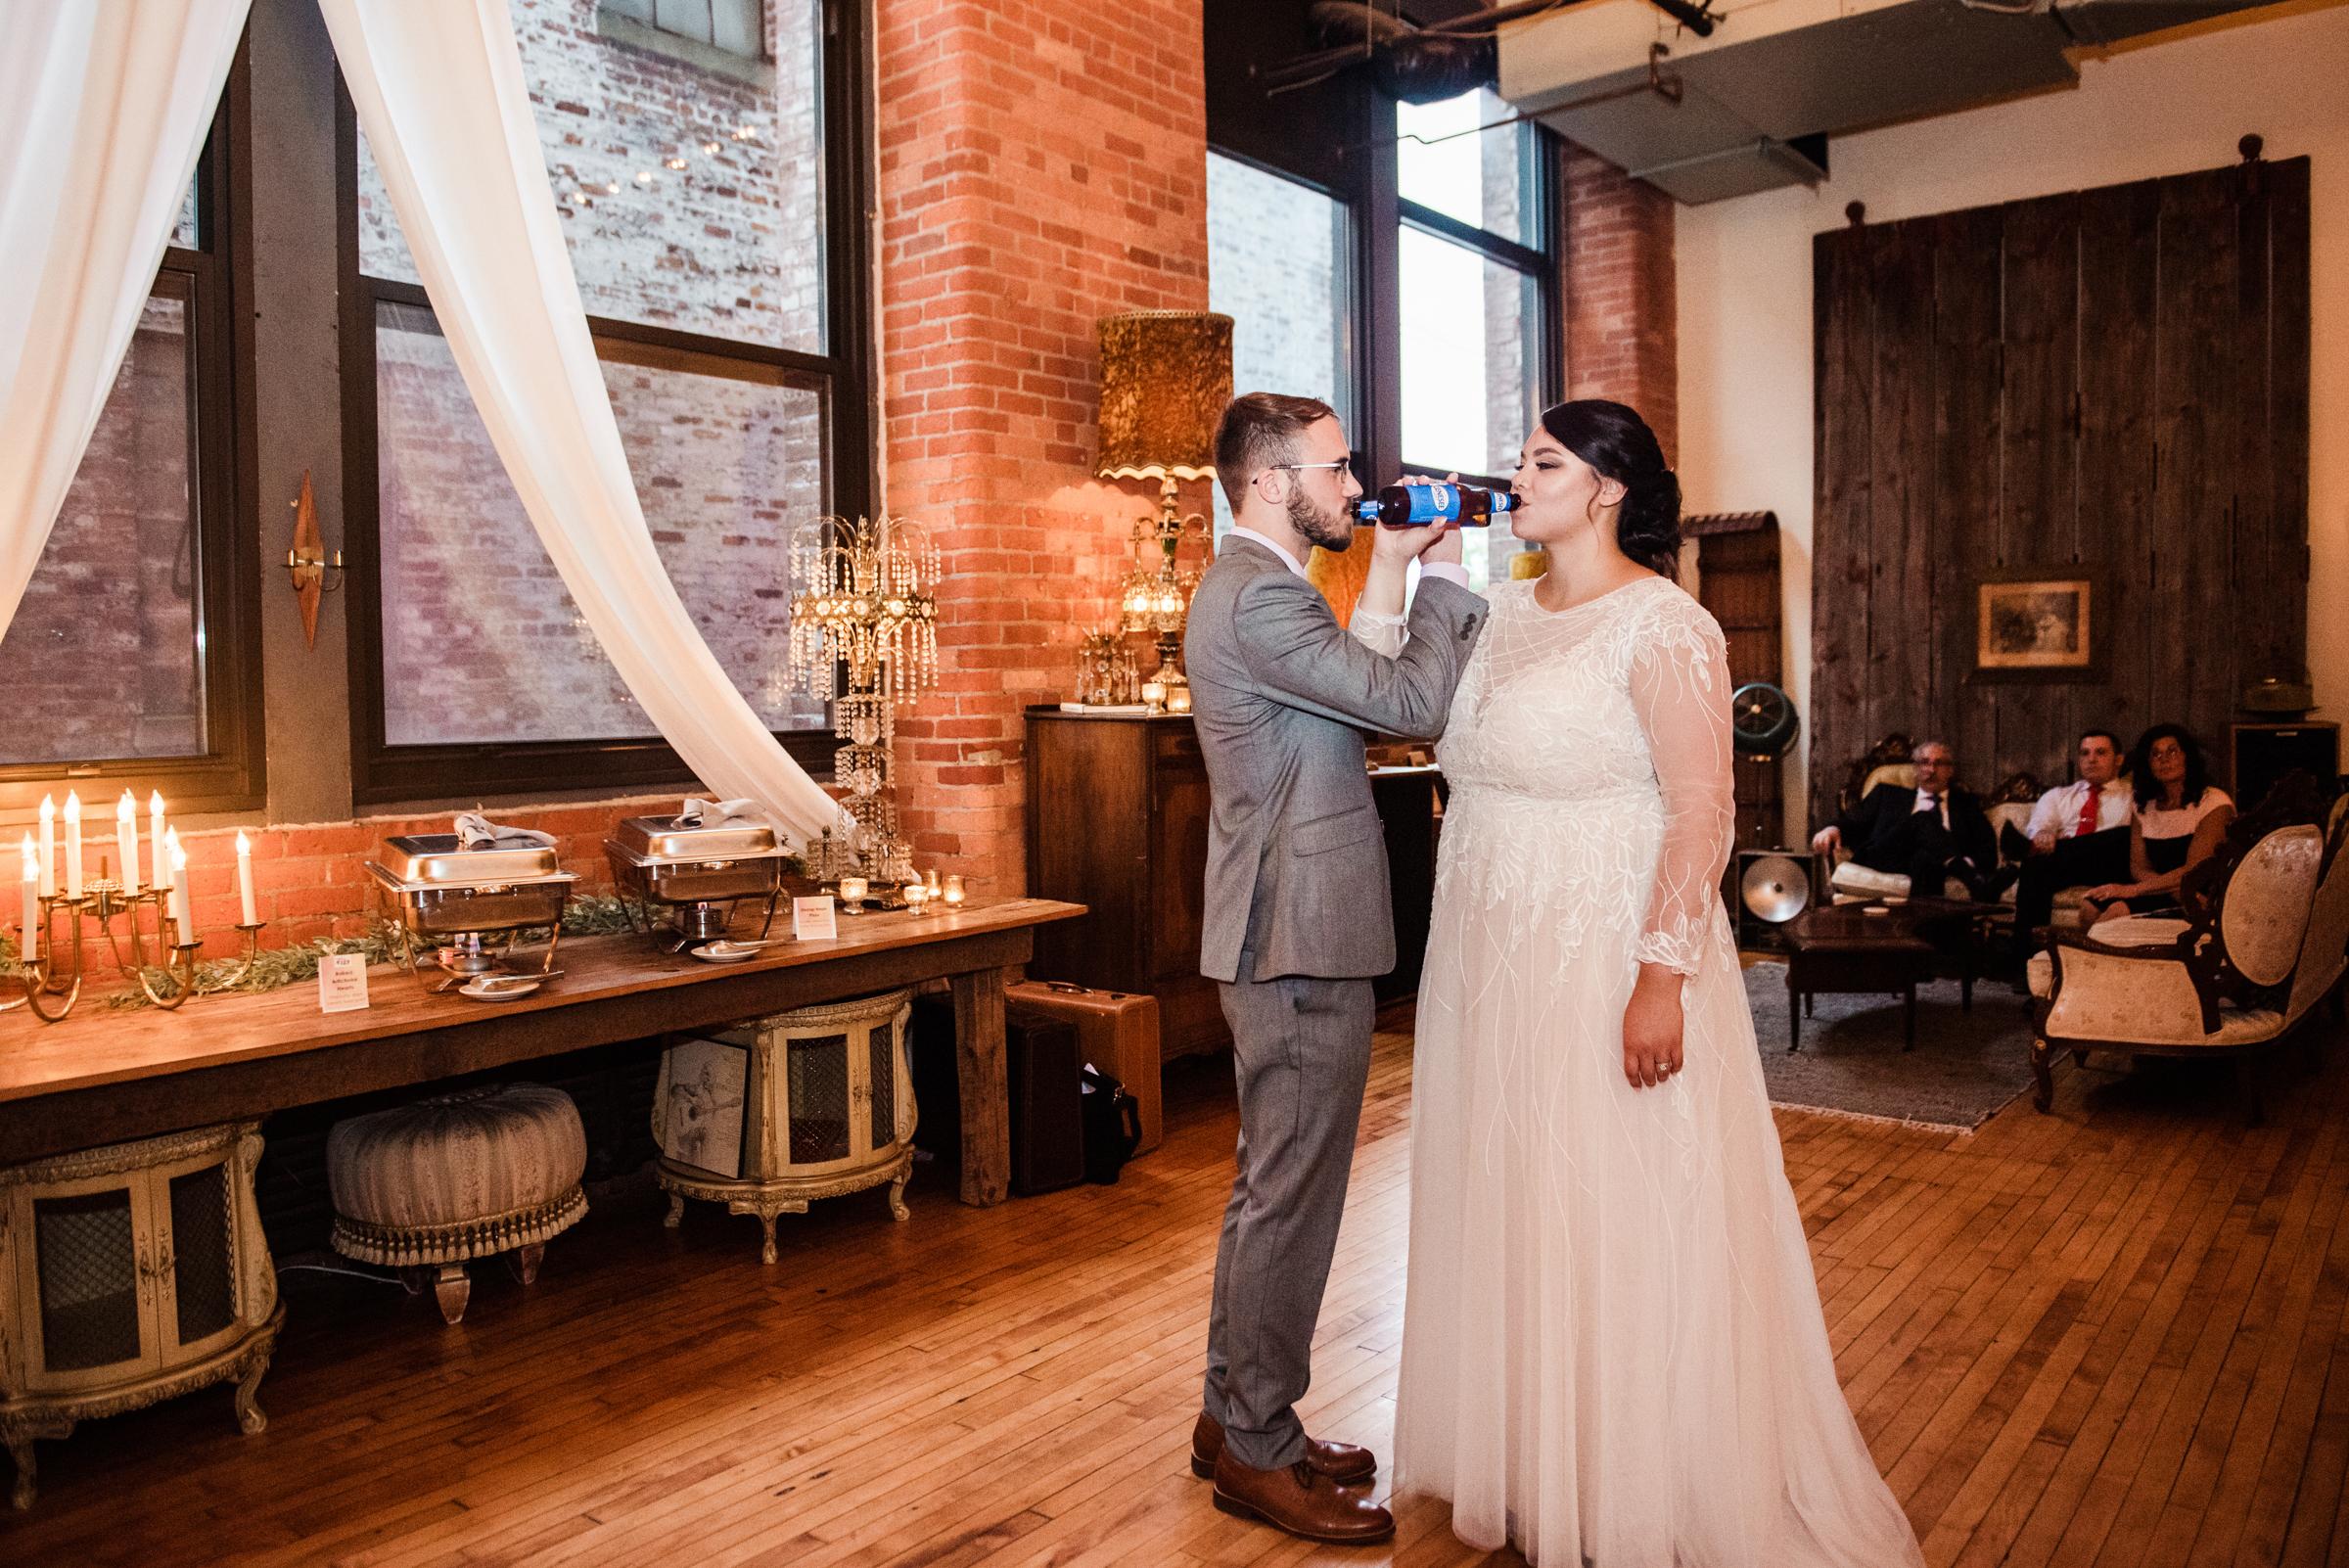 Studio_180_Lamberton_Conservatory_Rochester_Wedding_JILL_STUDIO_Rochester_NY_Photographer_DSC_9247.jpg